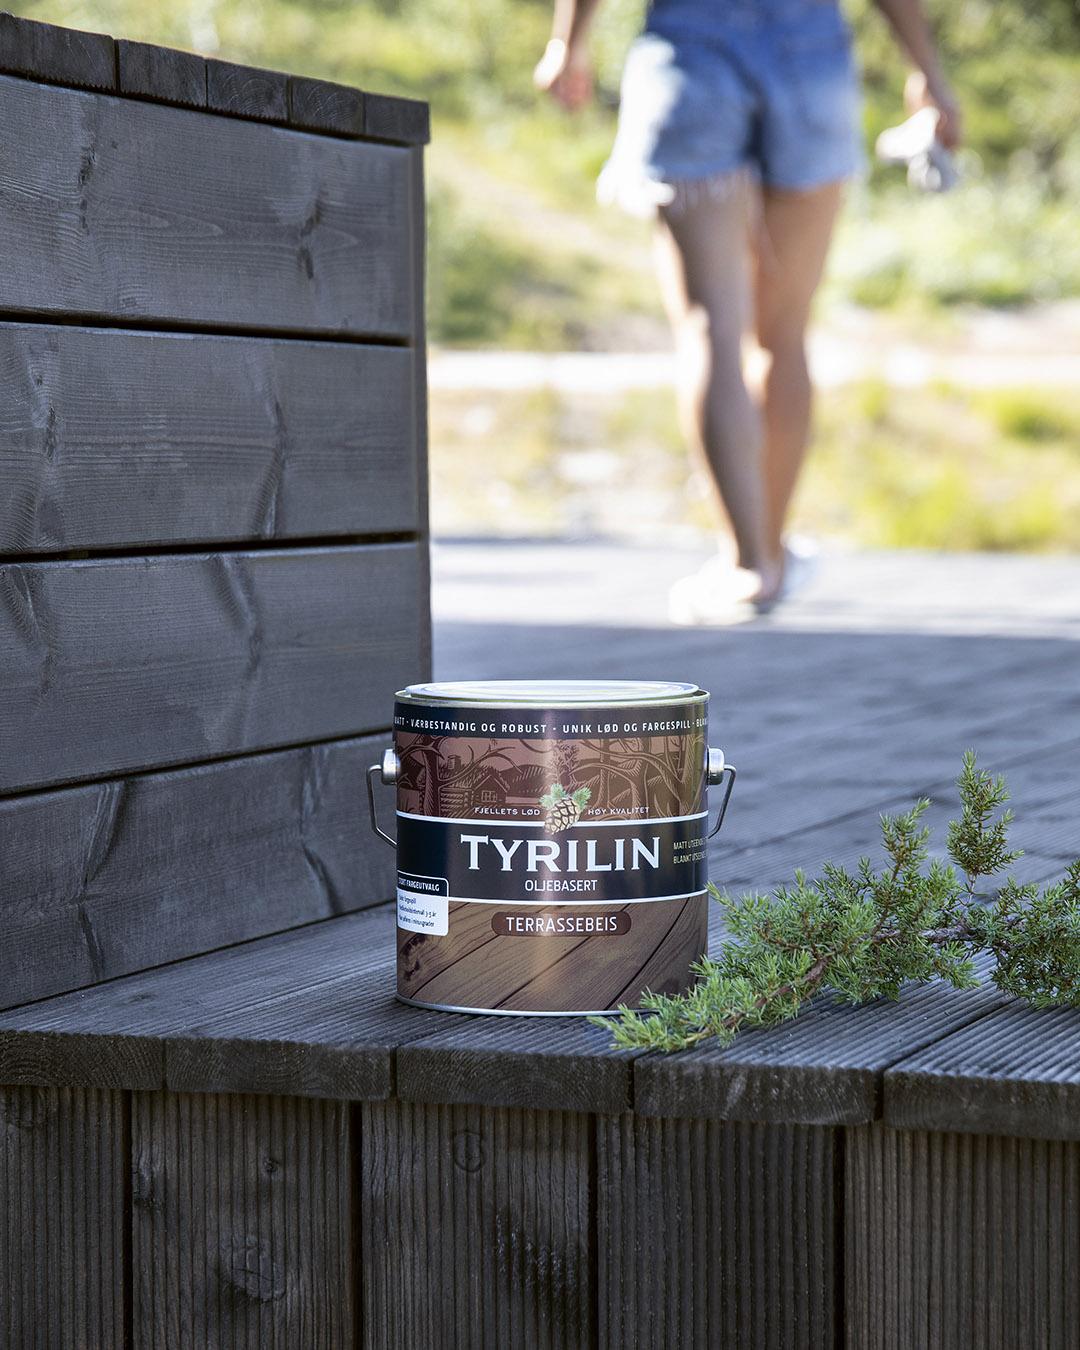 Tyrilin_Terrassebeis_Tiur